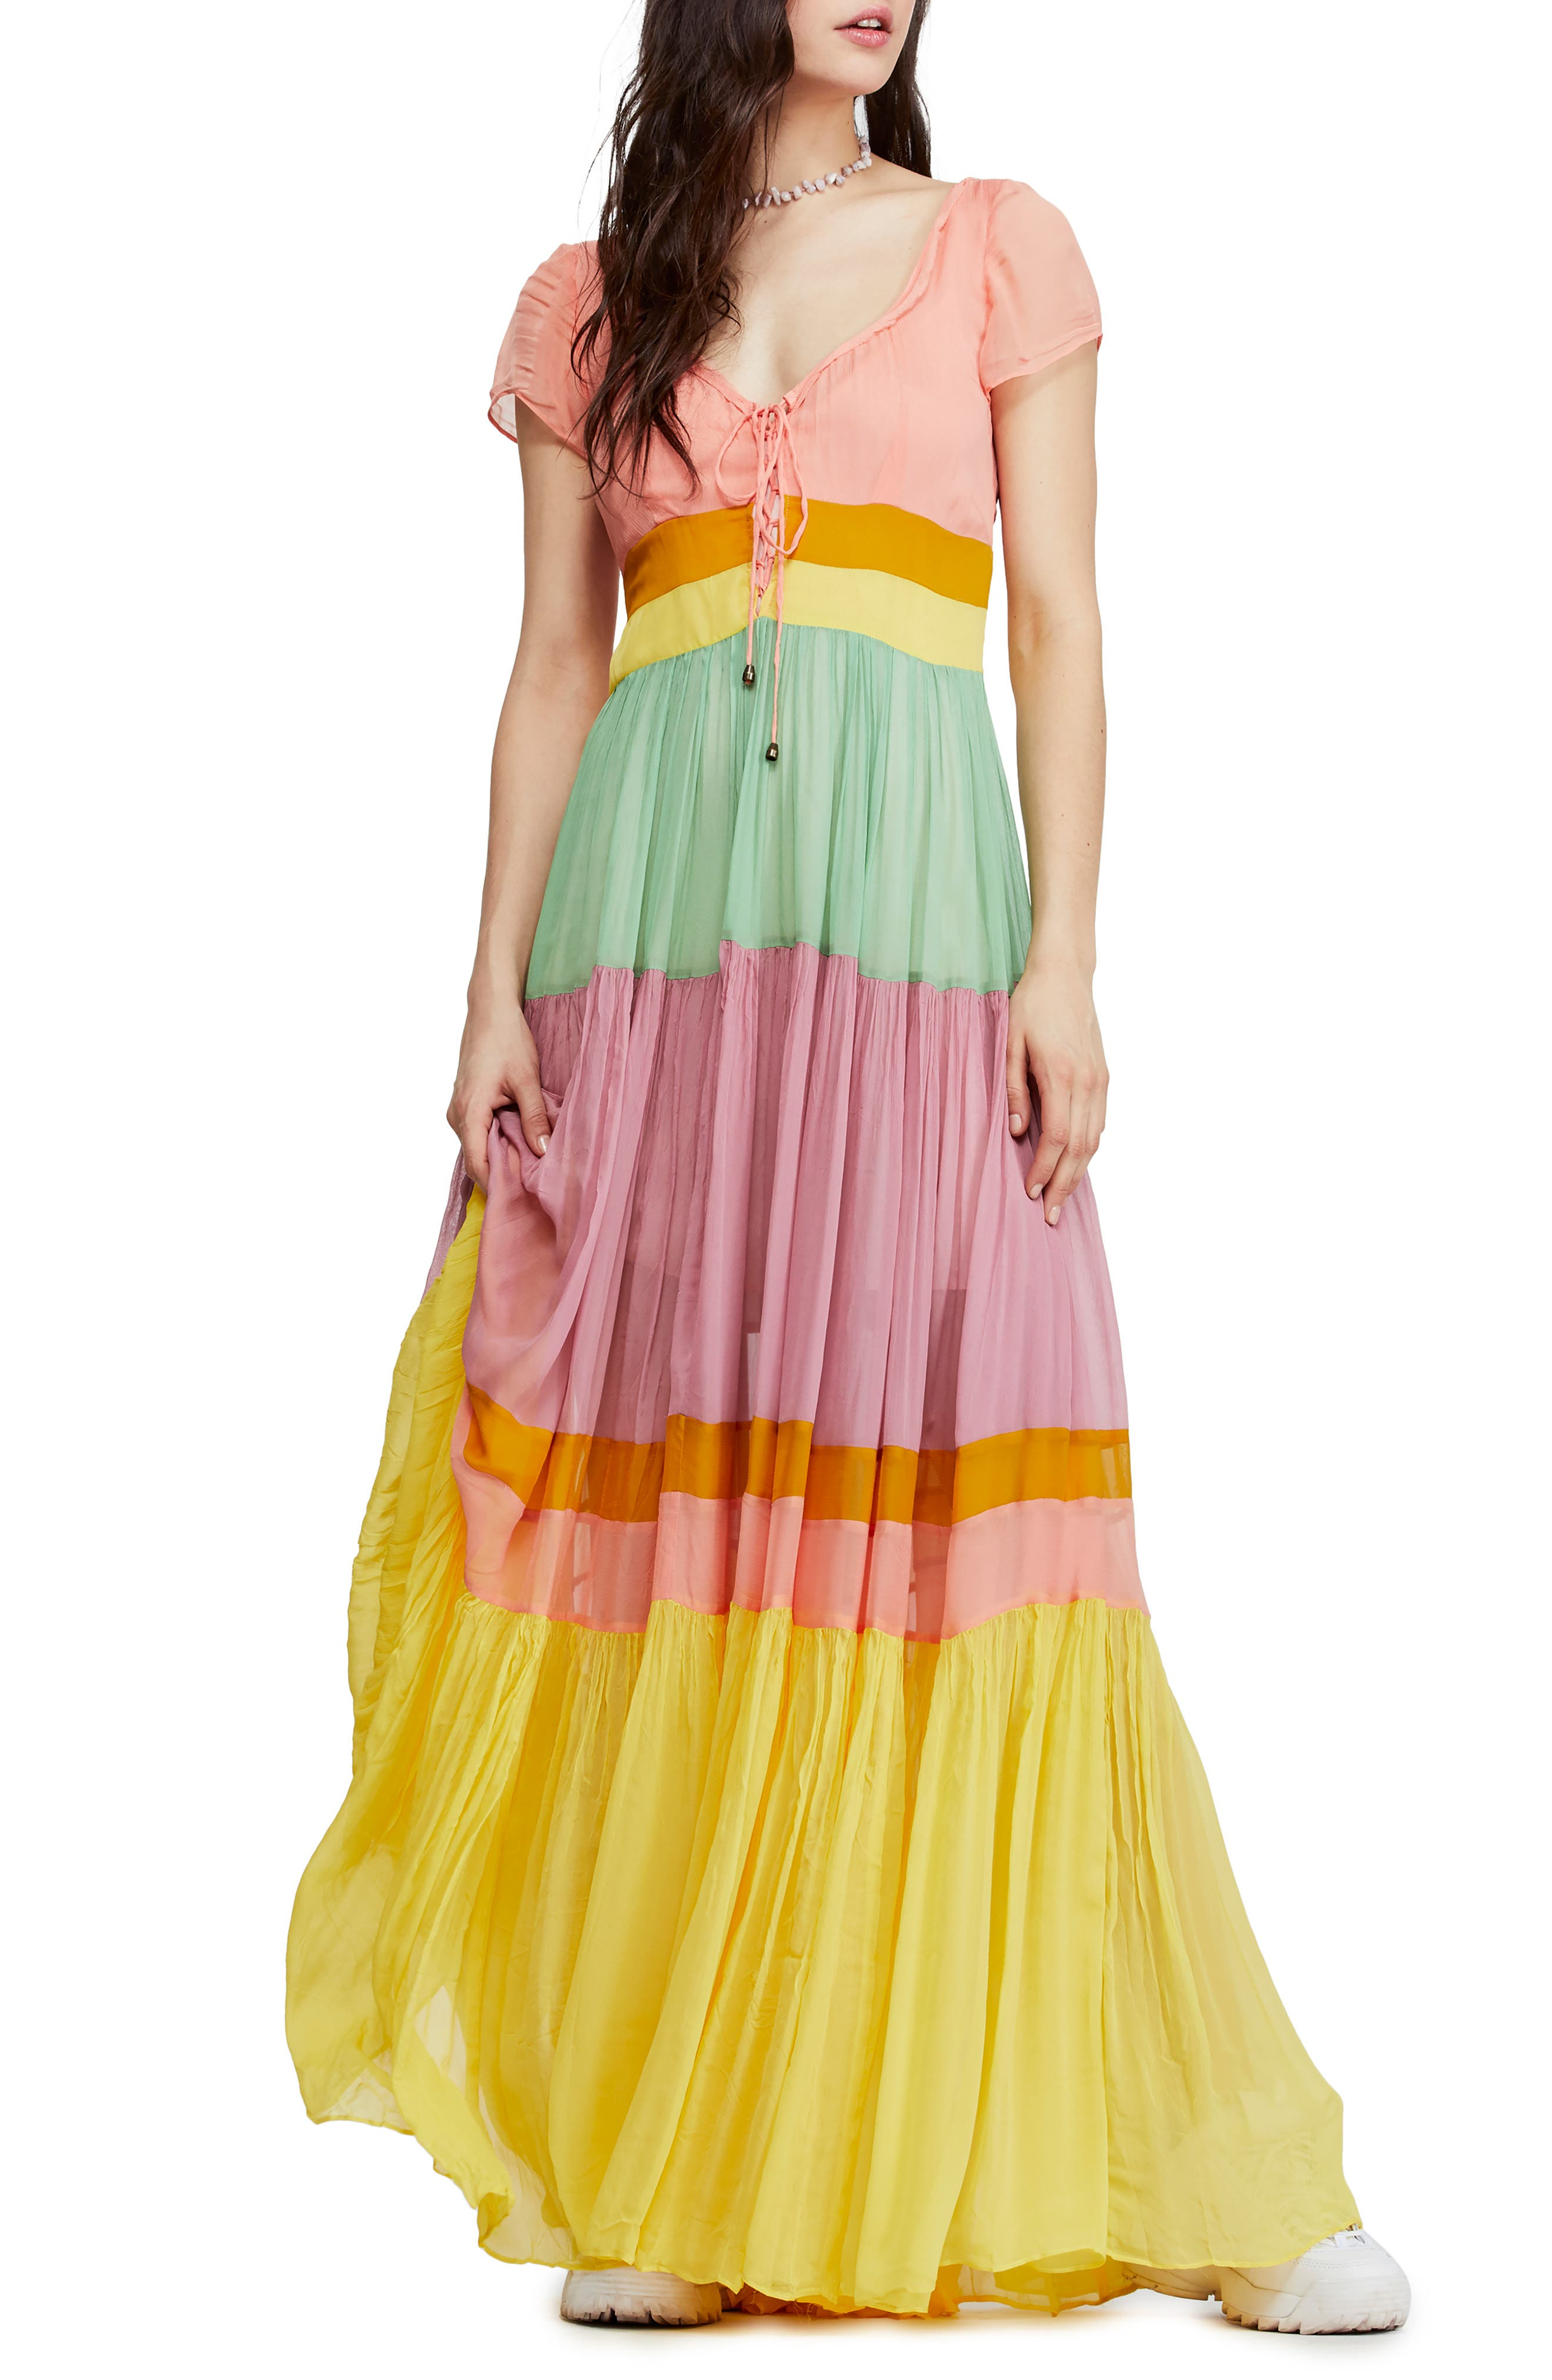 Free People Hocus Pocus Colorblock Maxi Dress, Pink